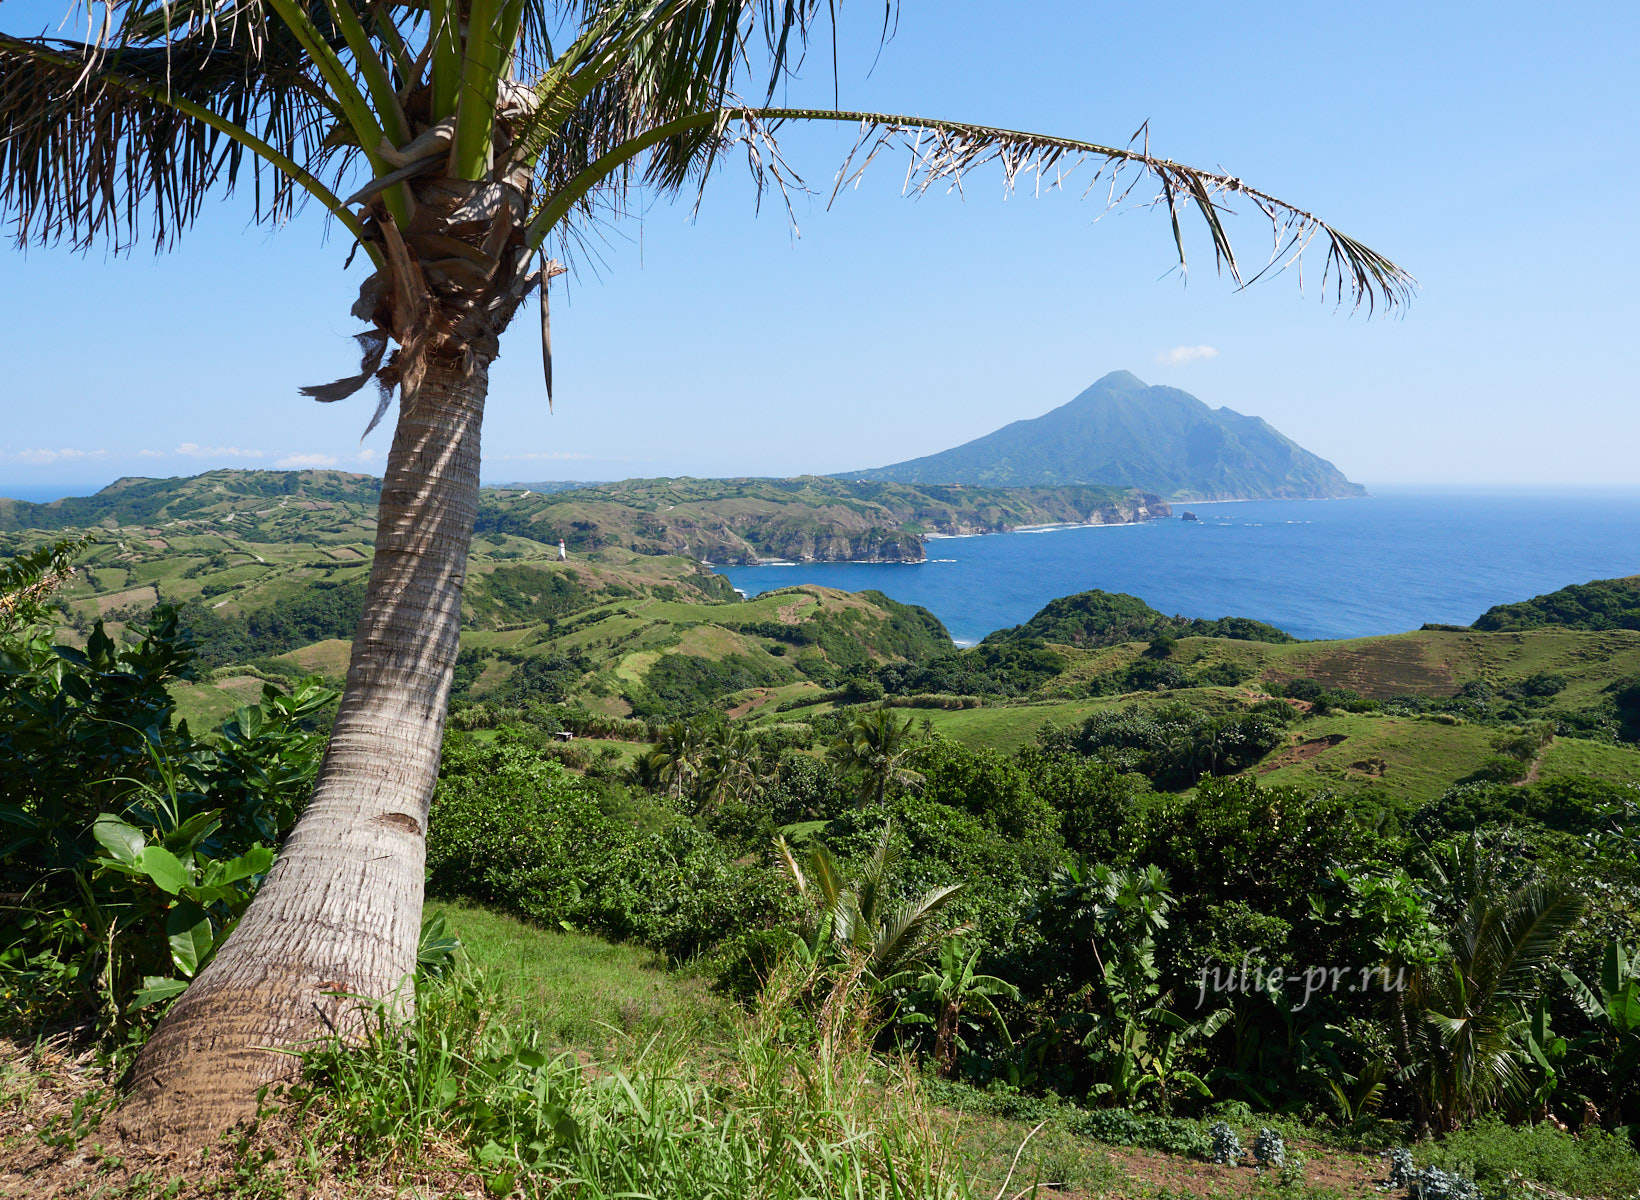 Филиппины, острова Батанес, Marlboro Hills, Mount Iraya